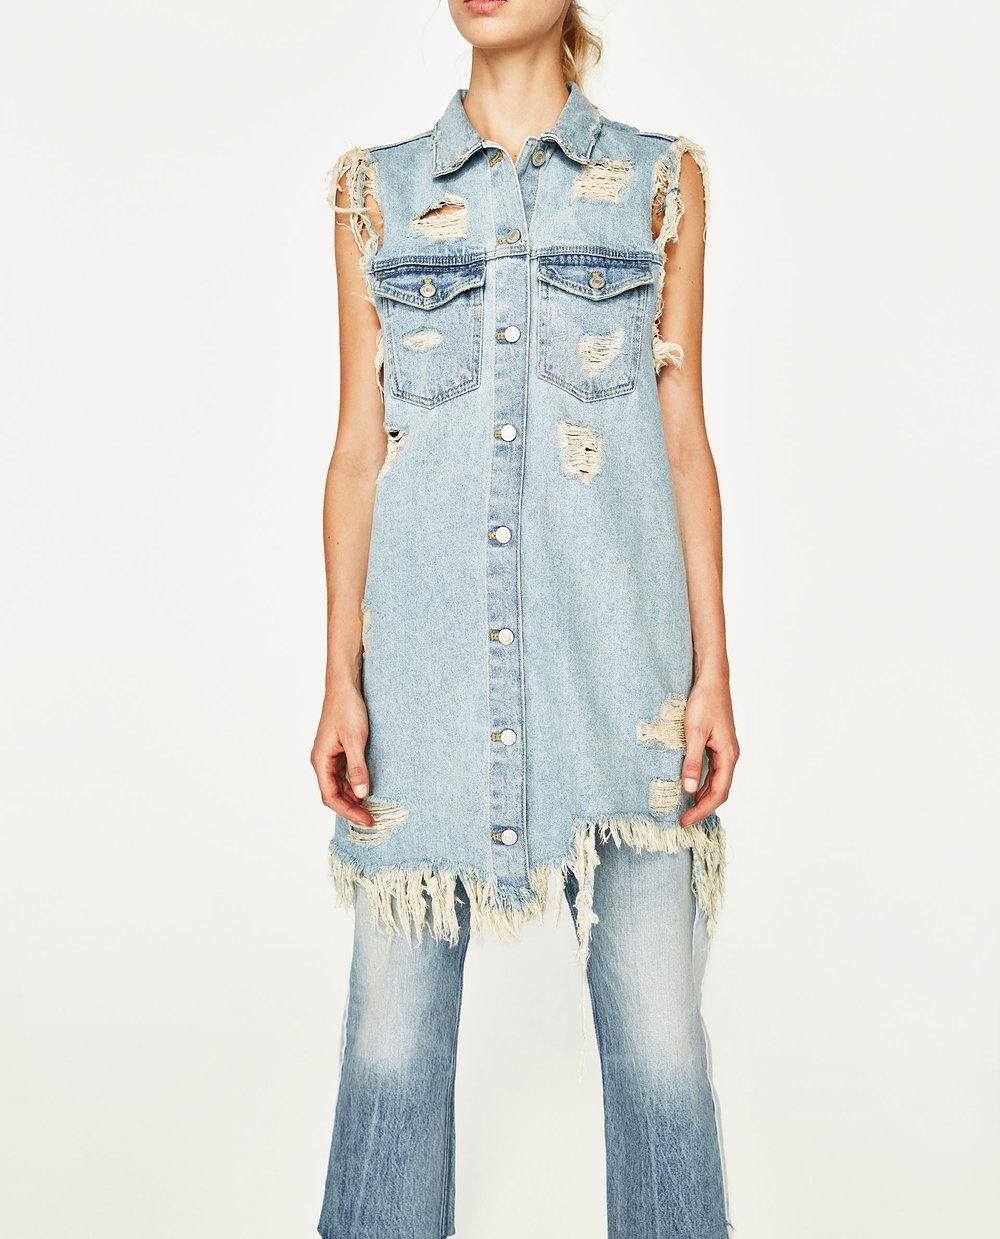 Denim Waistcoat Dress, $49.90